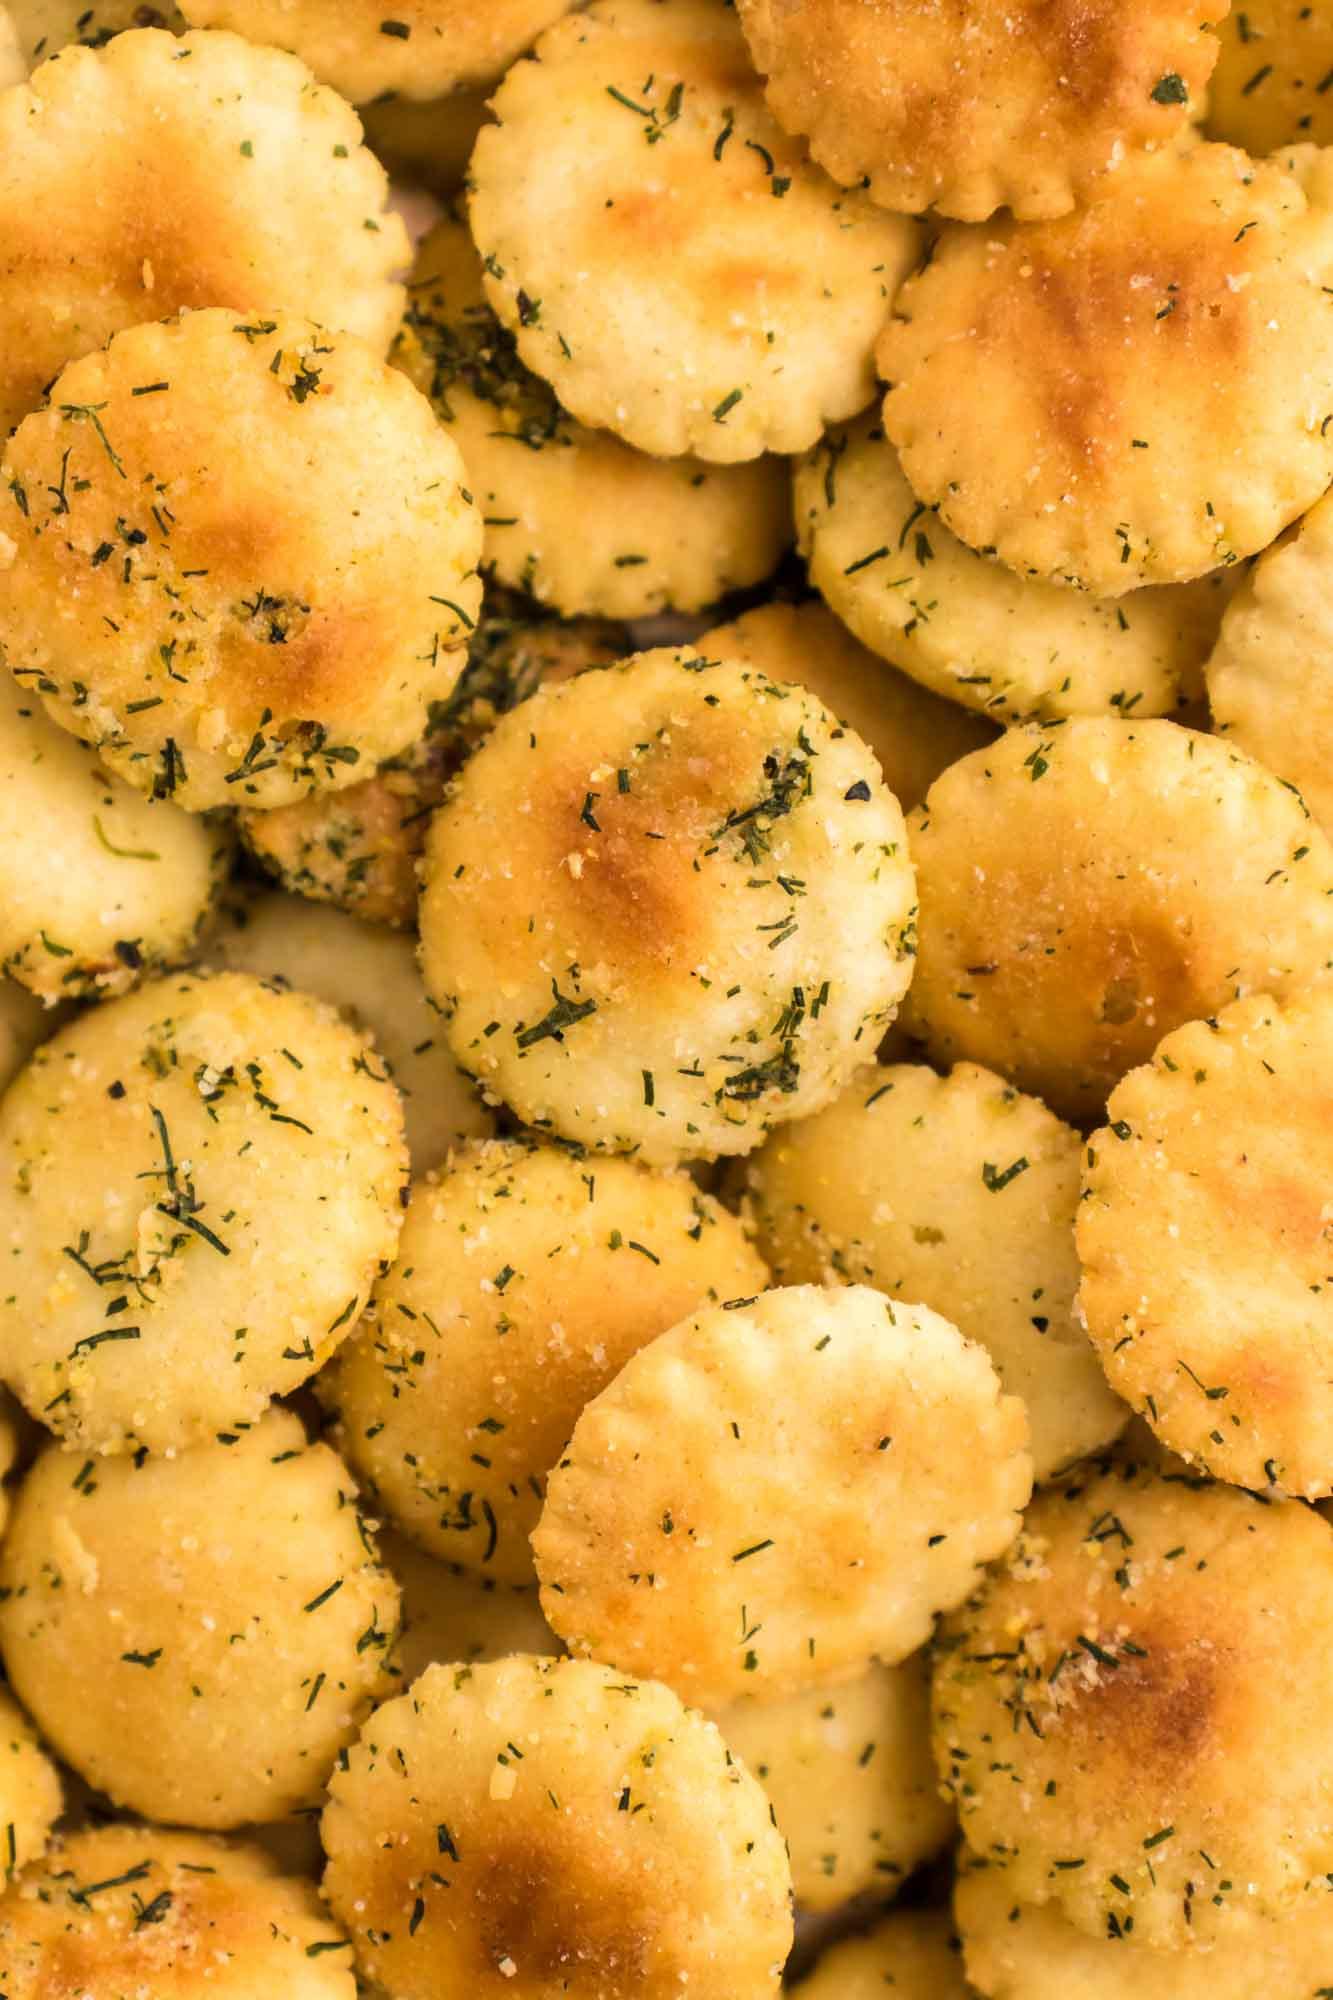 Close up shot of the seasoned crackers